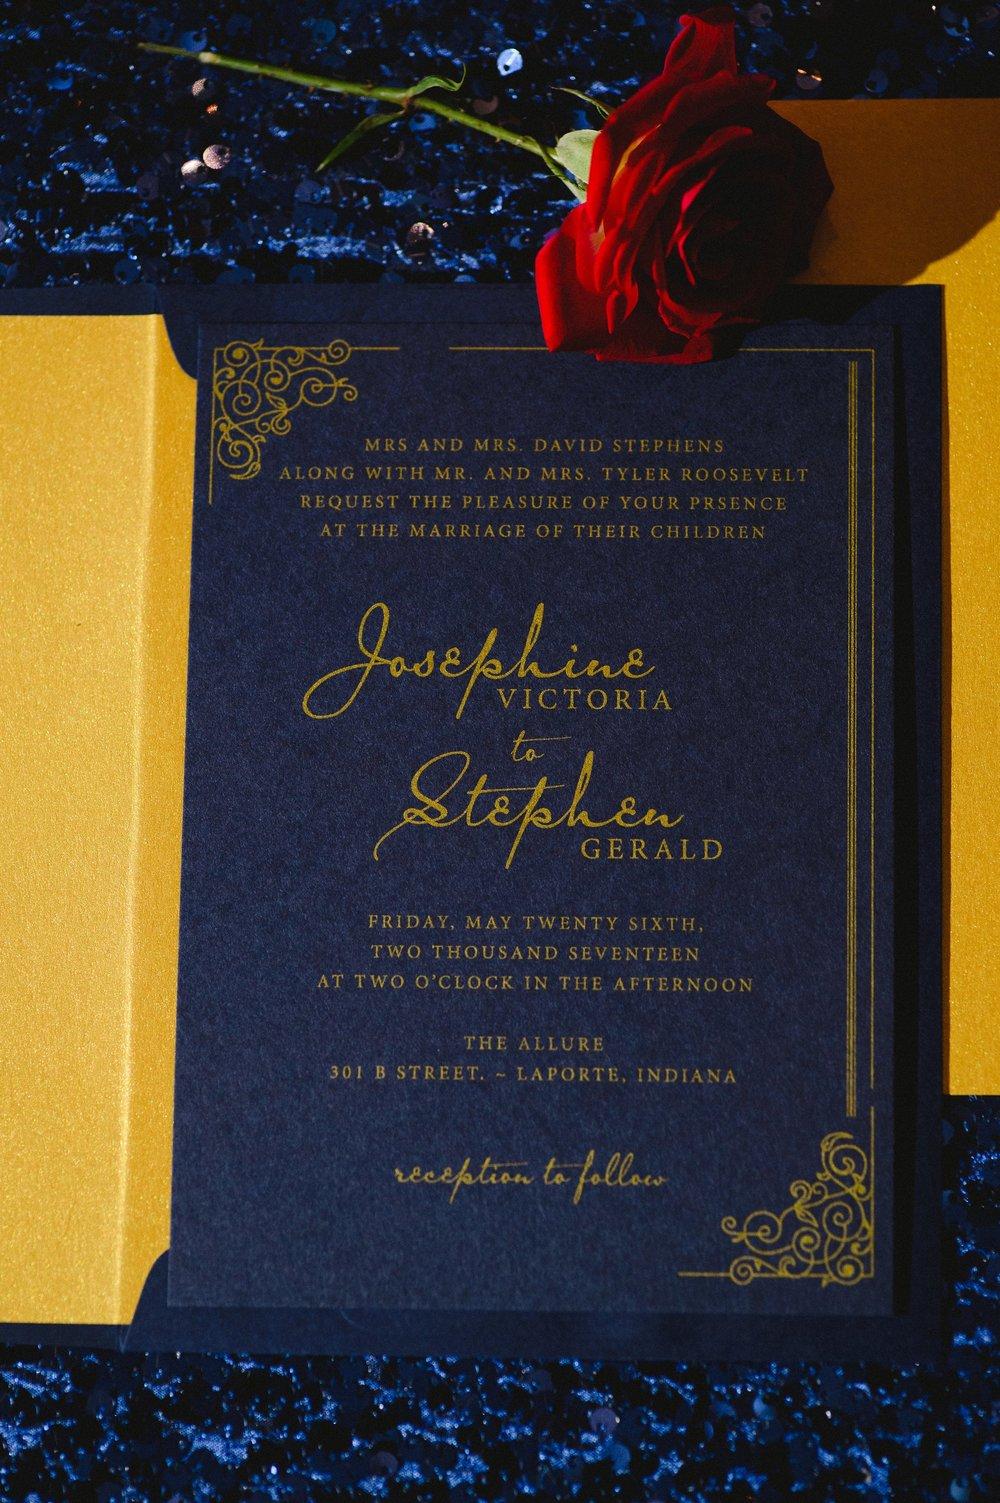 KatherineMurrayPhotography_StyledShoot_Wedding_BeautyAndTheBeast_ATaleAsOldAsTime_theAllure_LaPorteIndiana00252-min.jpg